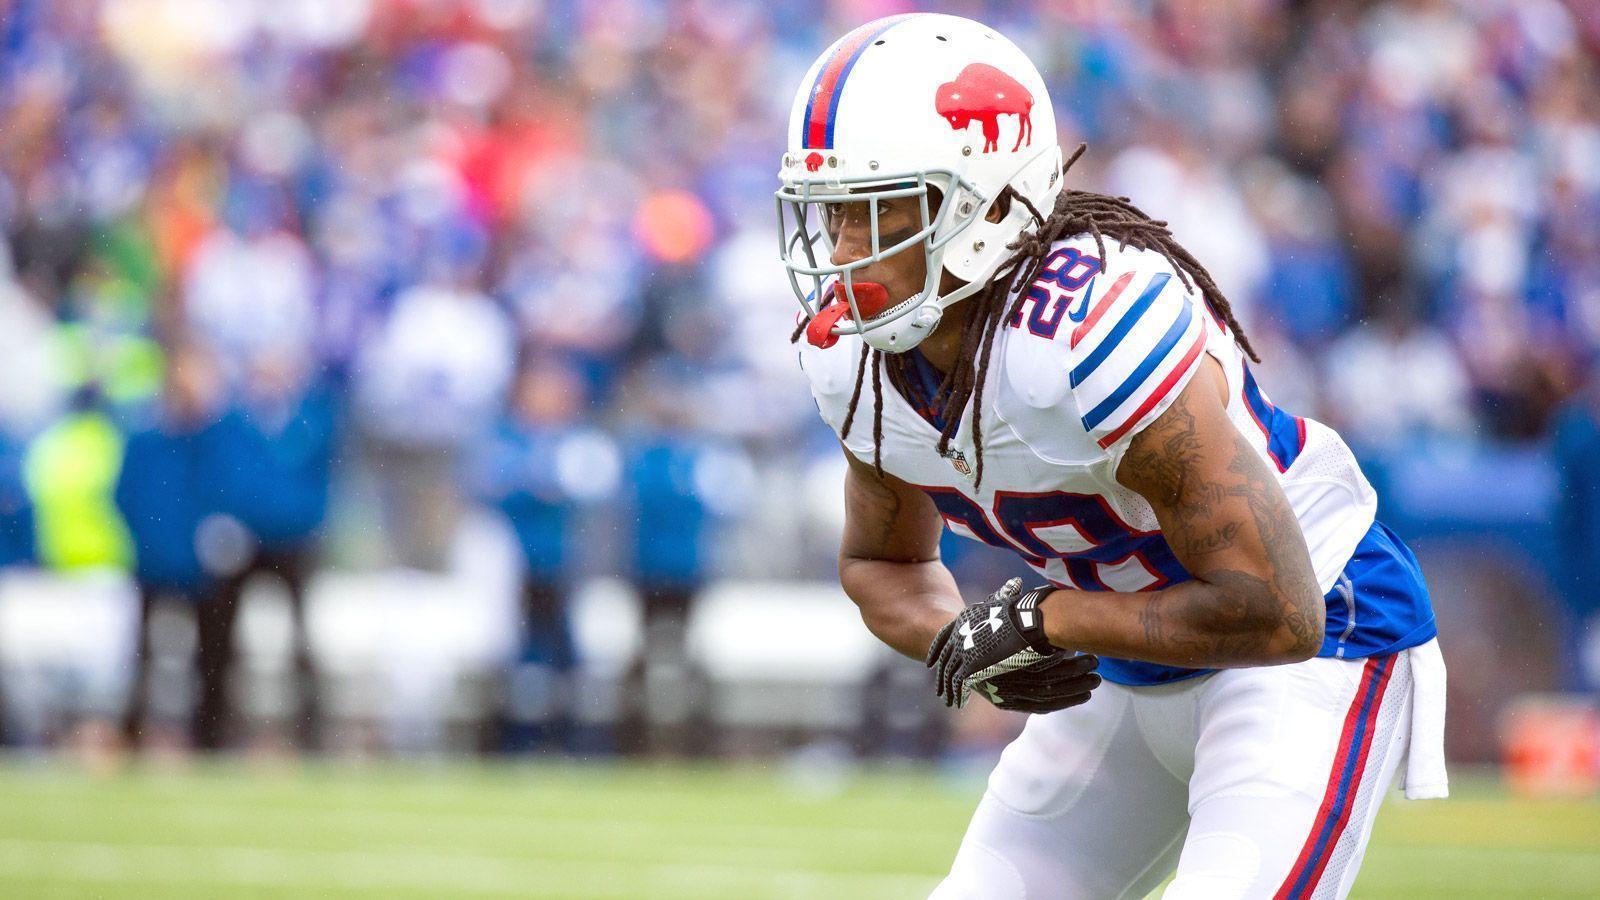 Bills rookie CB Ronald Darby leads NFL in key defensive statistic ...